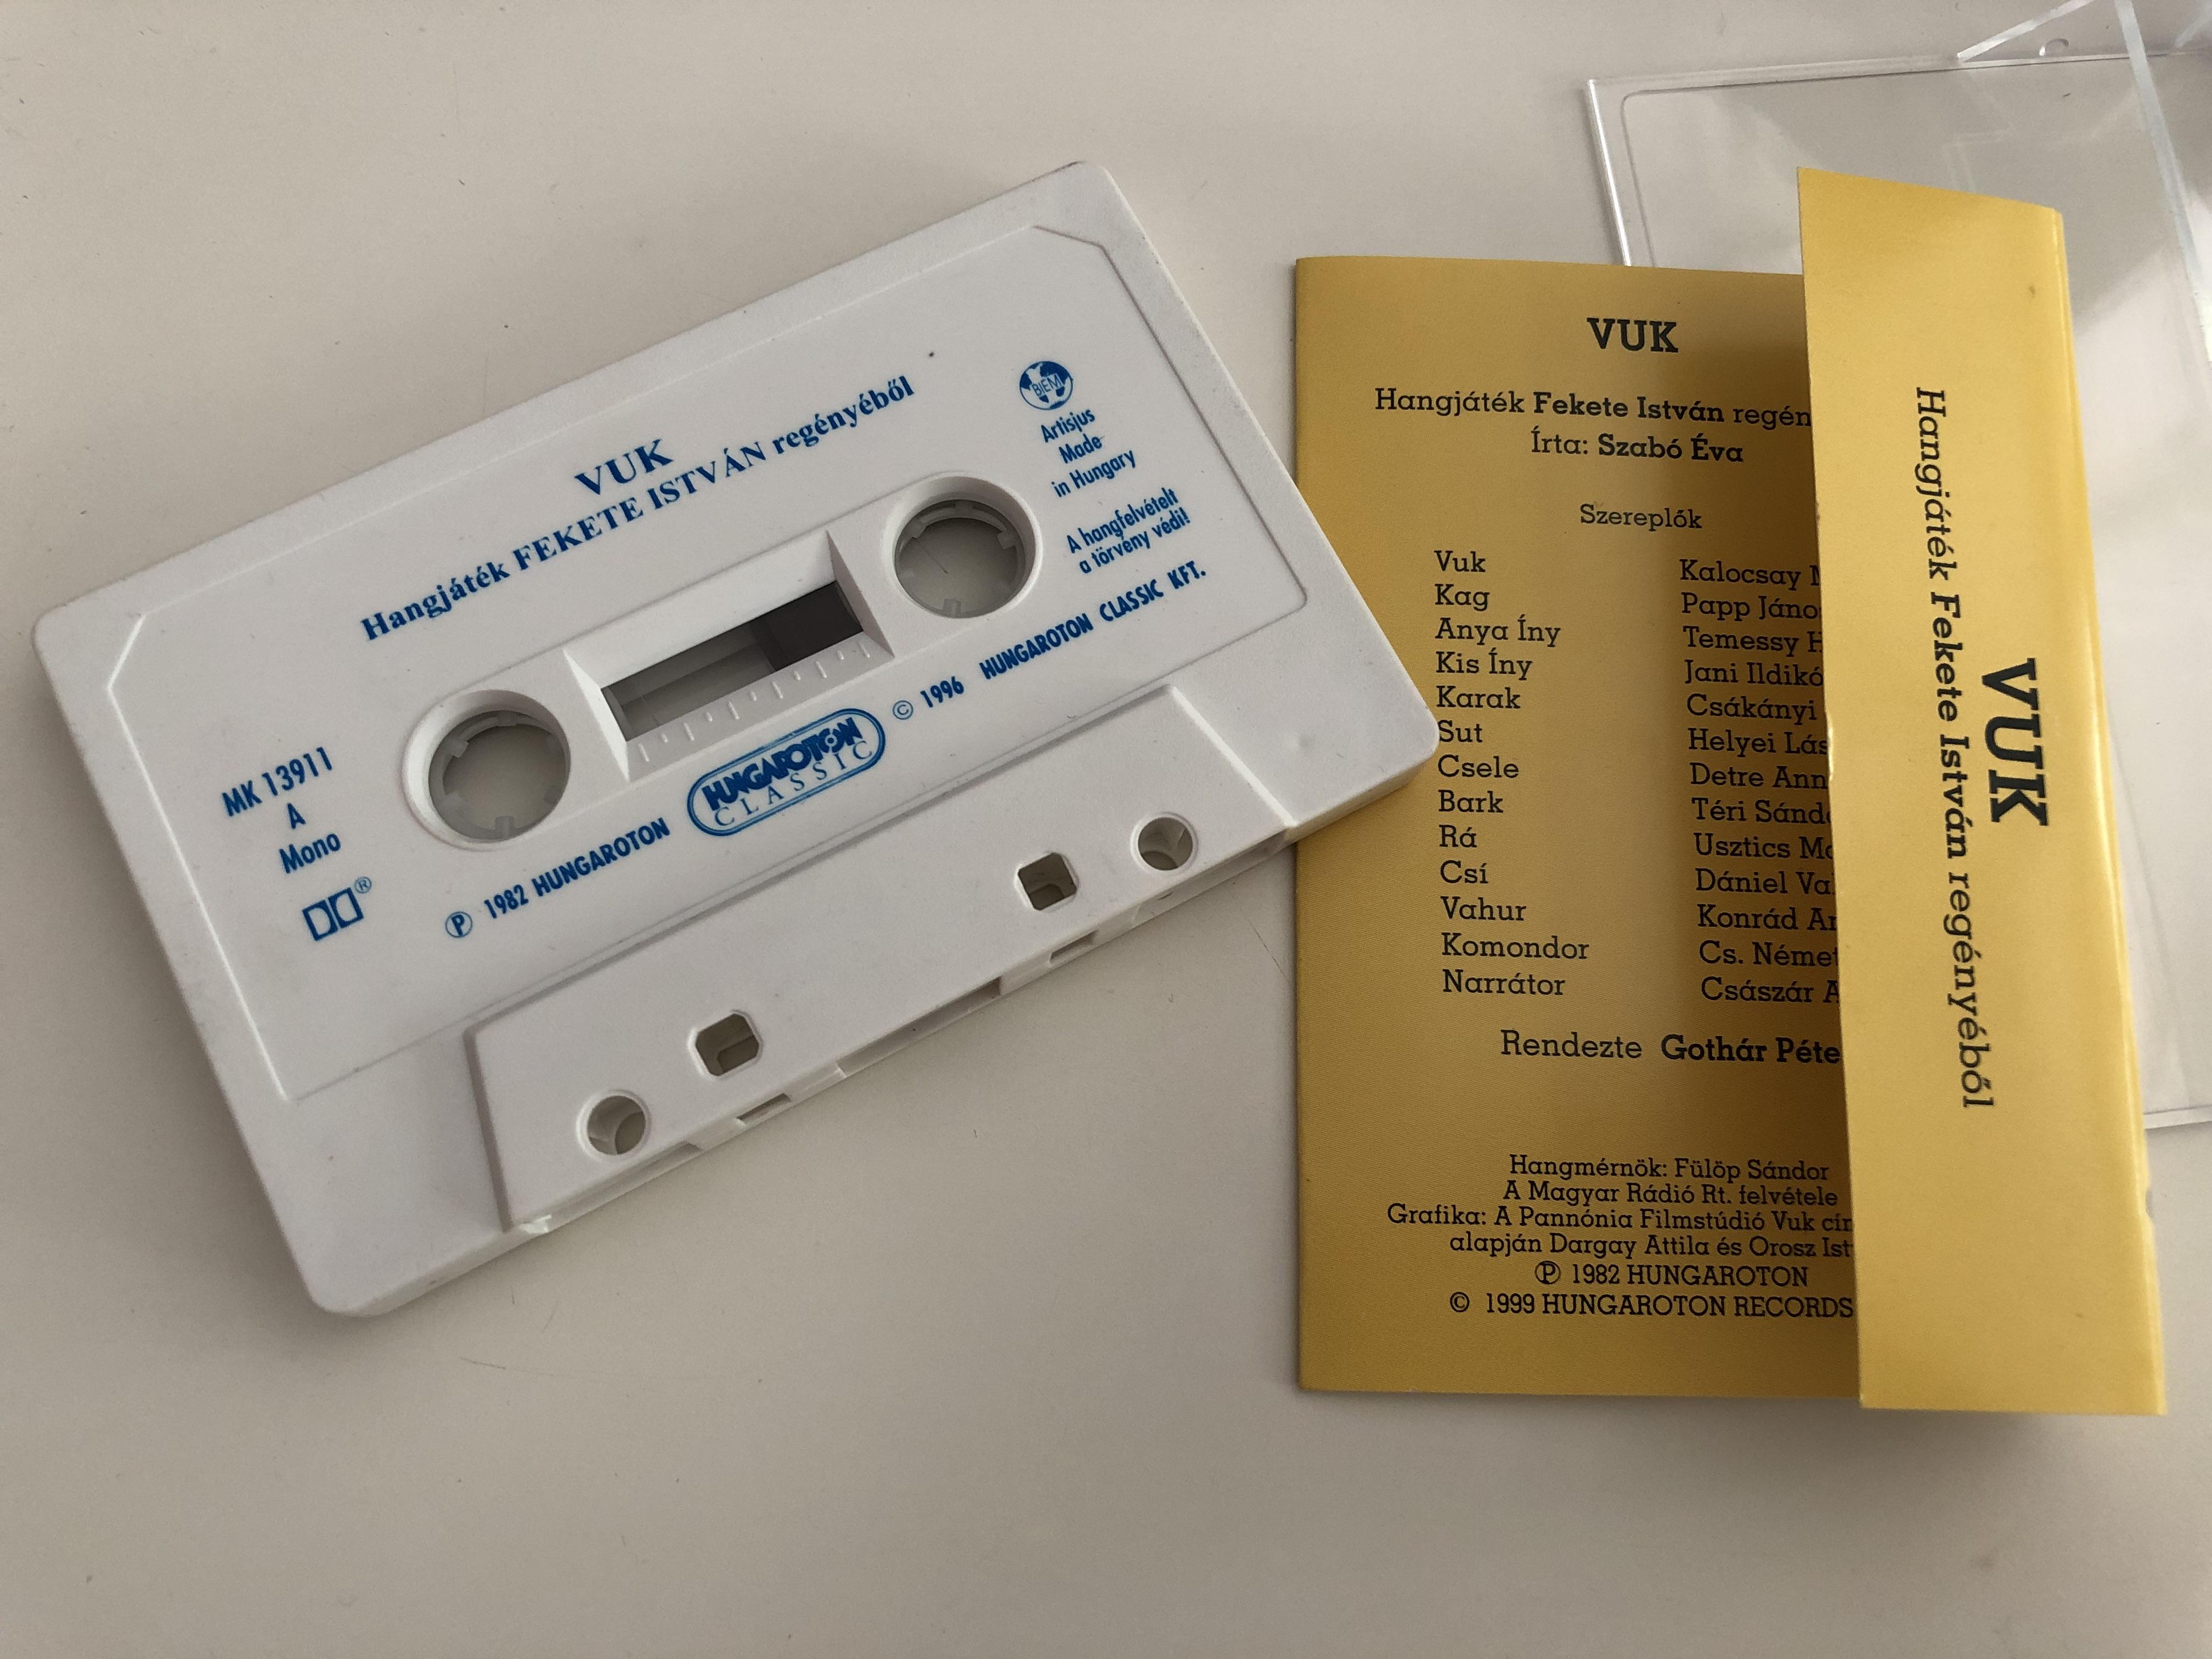 vuk-hangj-t-k-fekete-istv-n-reg-ny-b-l-directed-by-goth-r-p-ter-written-by-szab-va-hungarian-audio-drama-based-on-vuk-the-litte-fox-hungaroton-classic-audio-casette-1982-mk-13911-4-.jpg